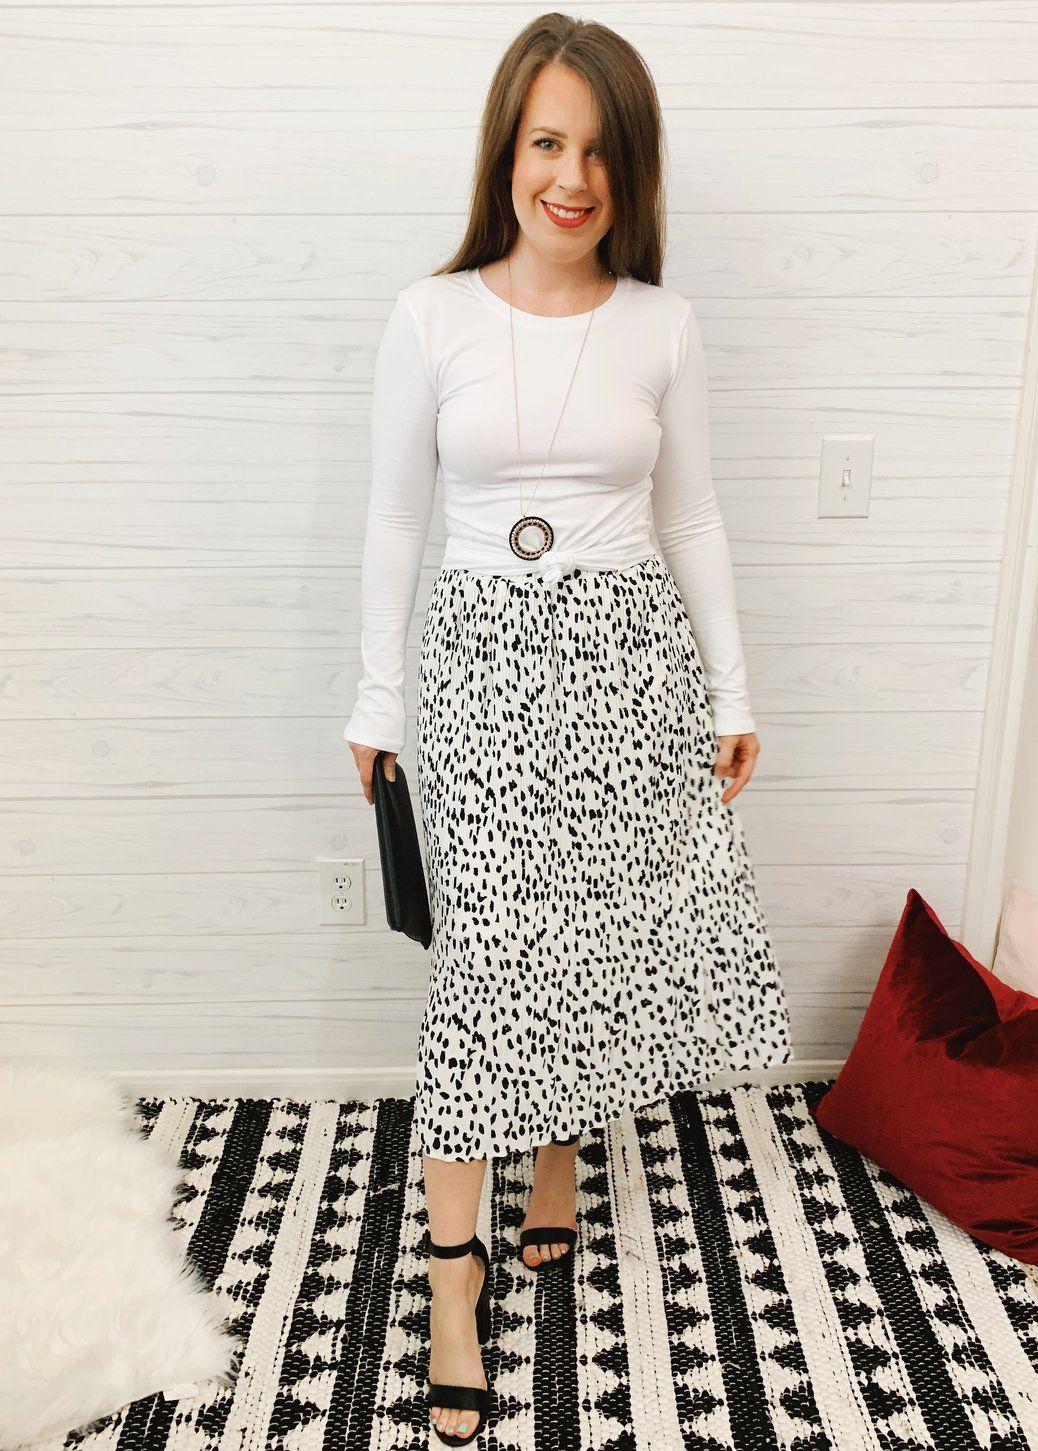 Nicole Wrap Front Midi Dress With Belt Terracotta 8-18